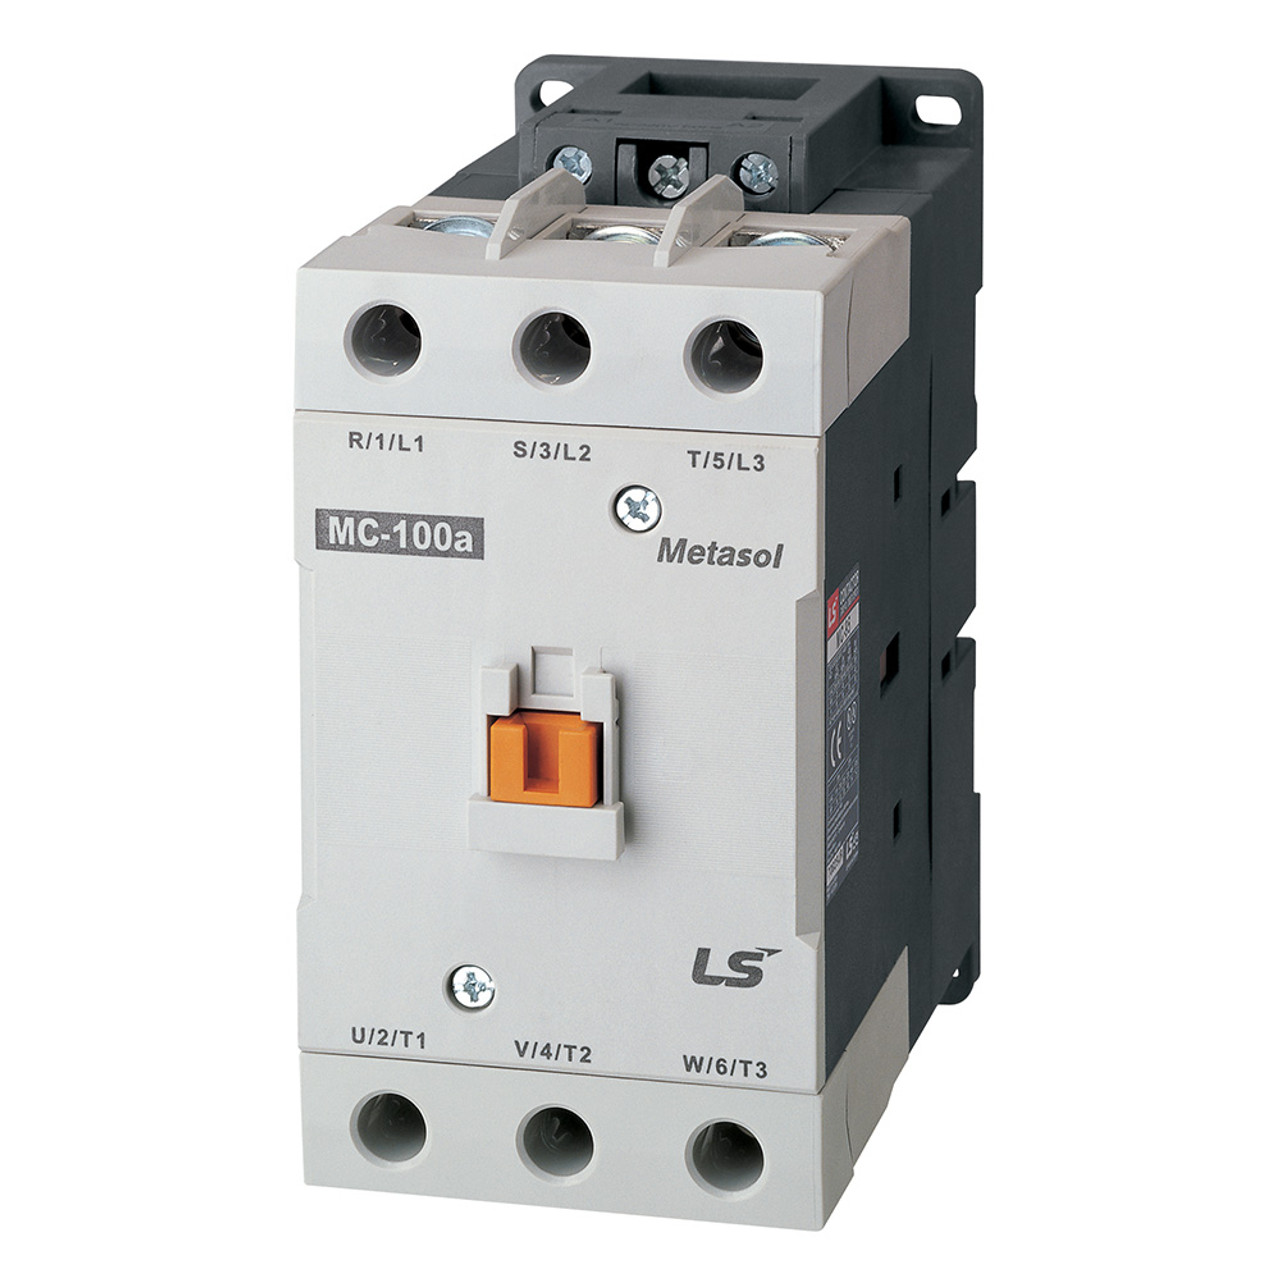 medium resolution of lsis mc 100a metasol series magnetic contactor ac24v 50 60hz screw 2a2b